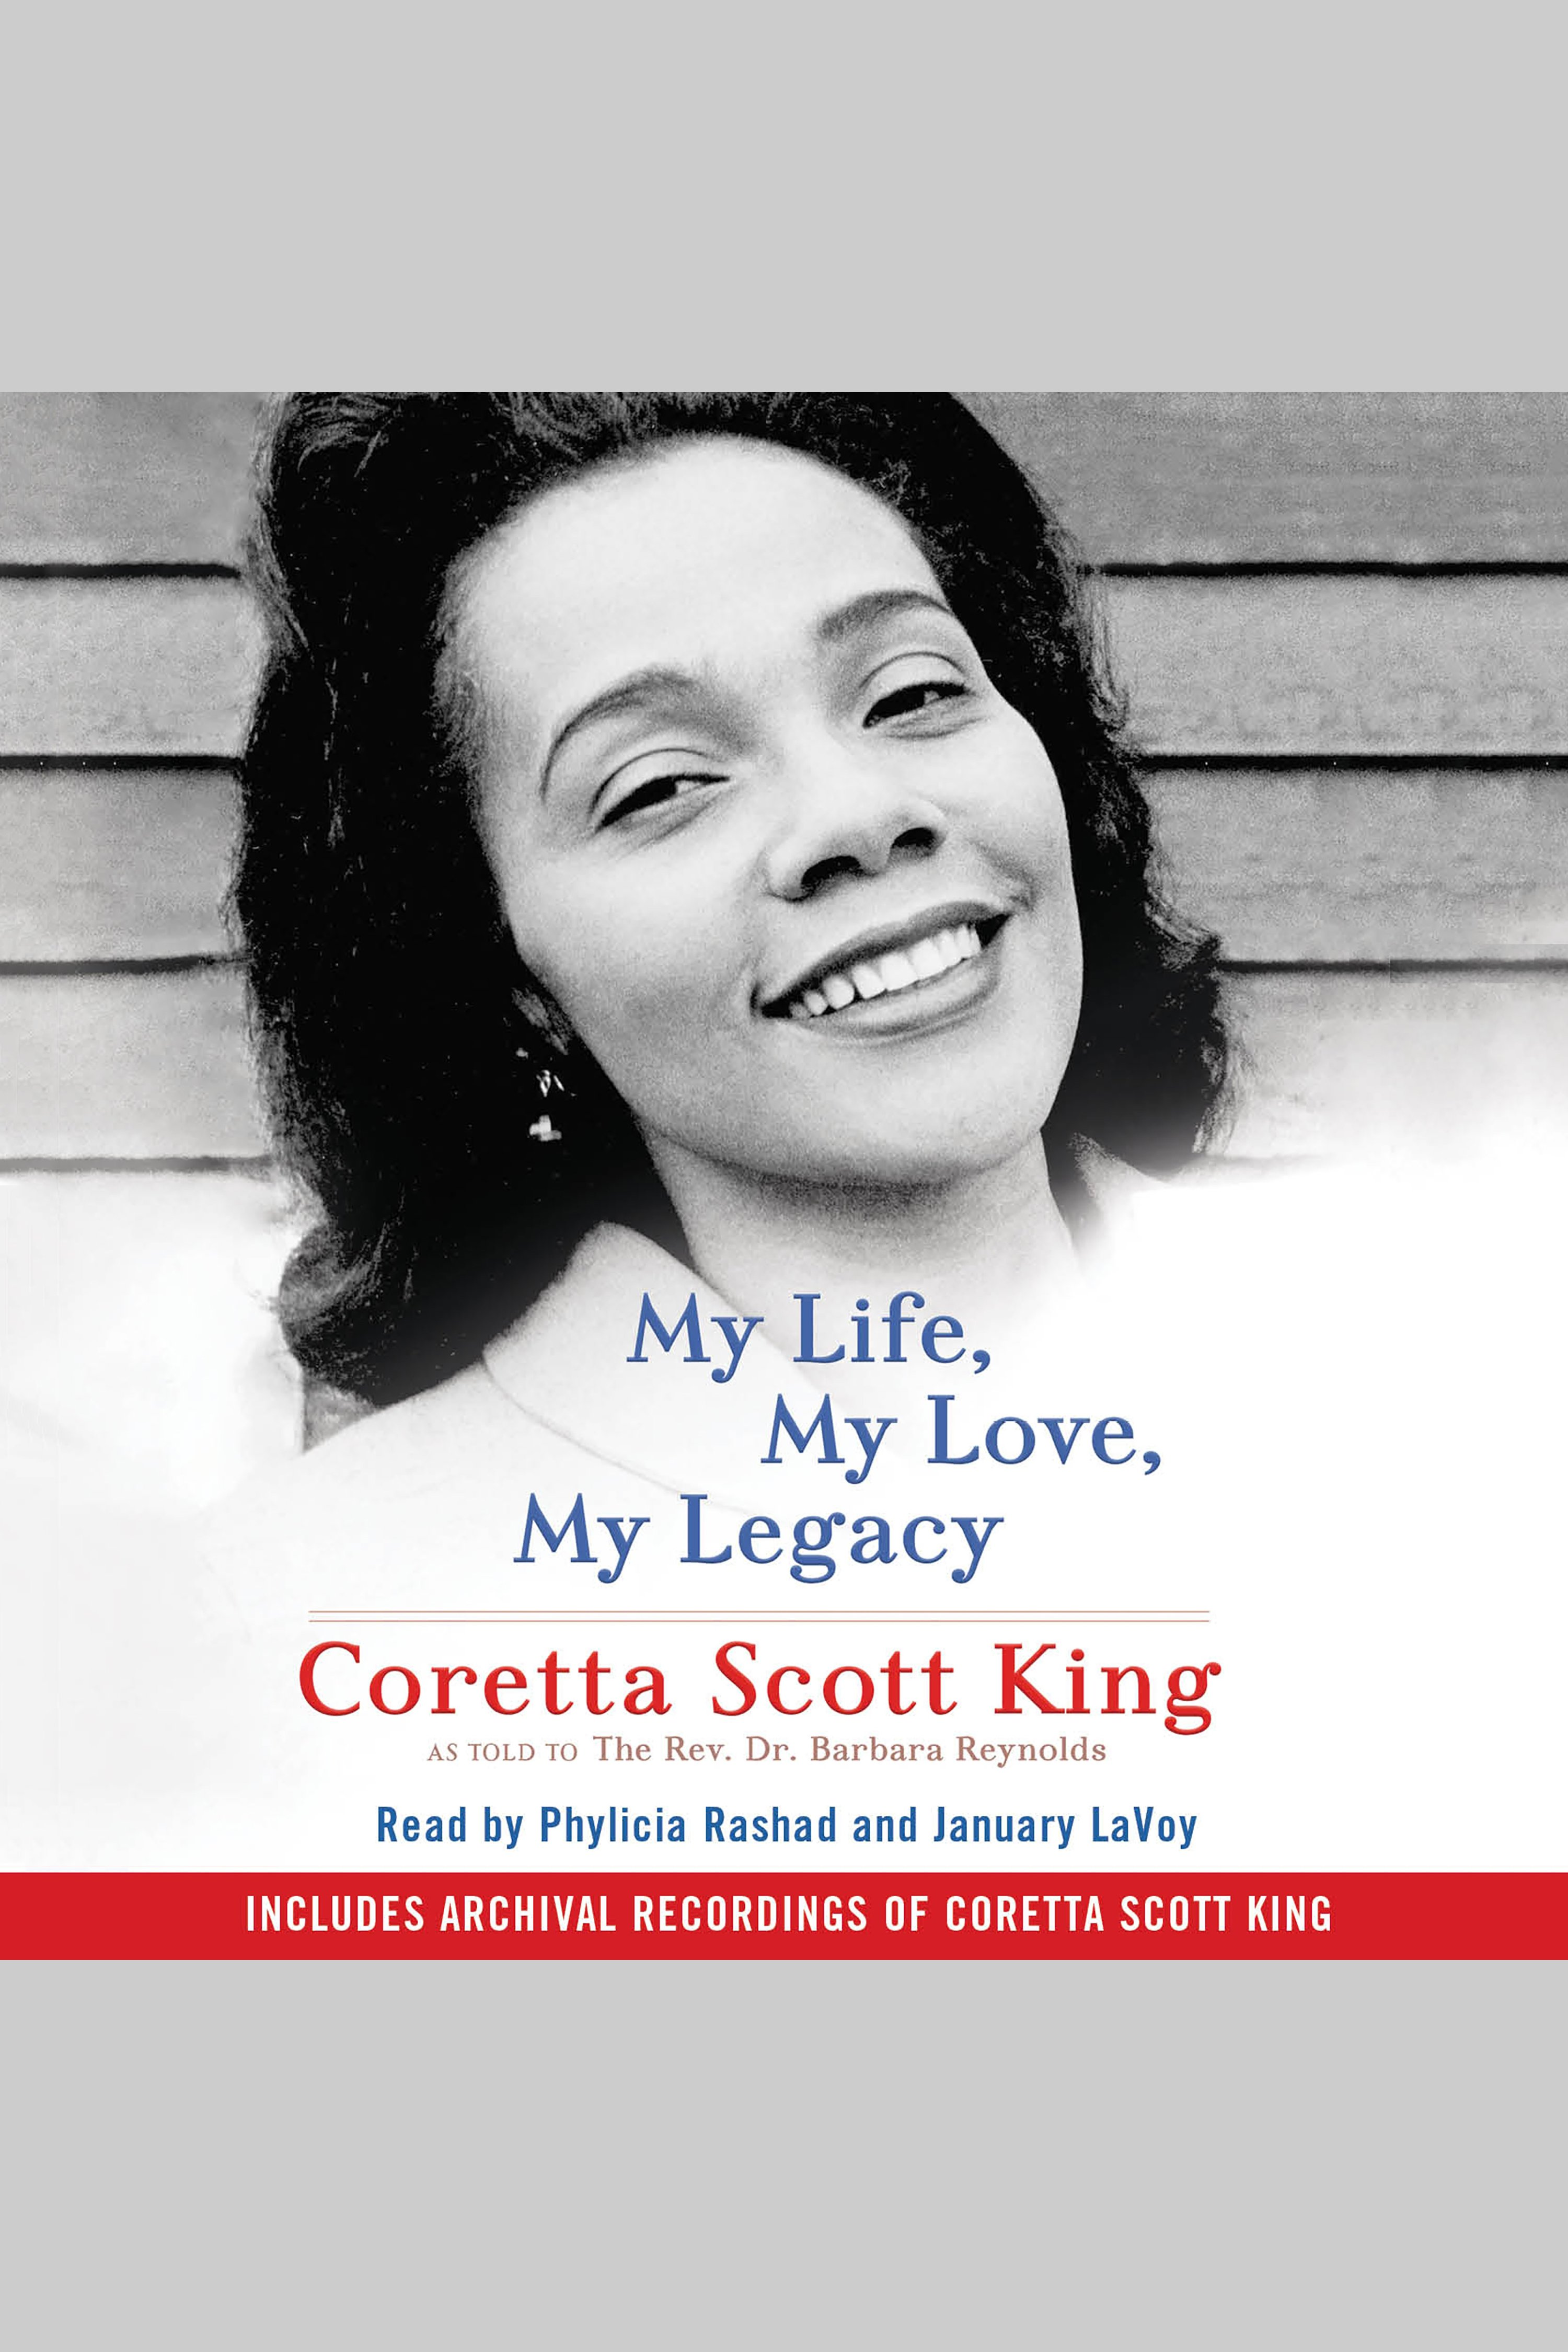 My life, my love, my legacy [AudioEbook]